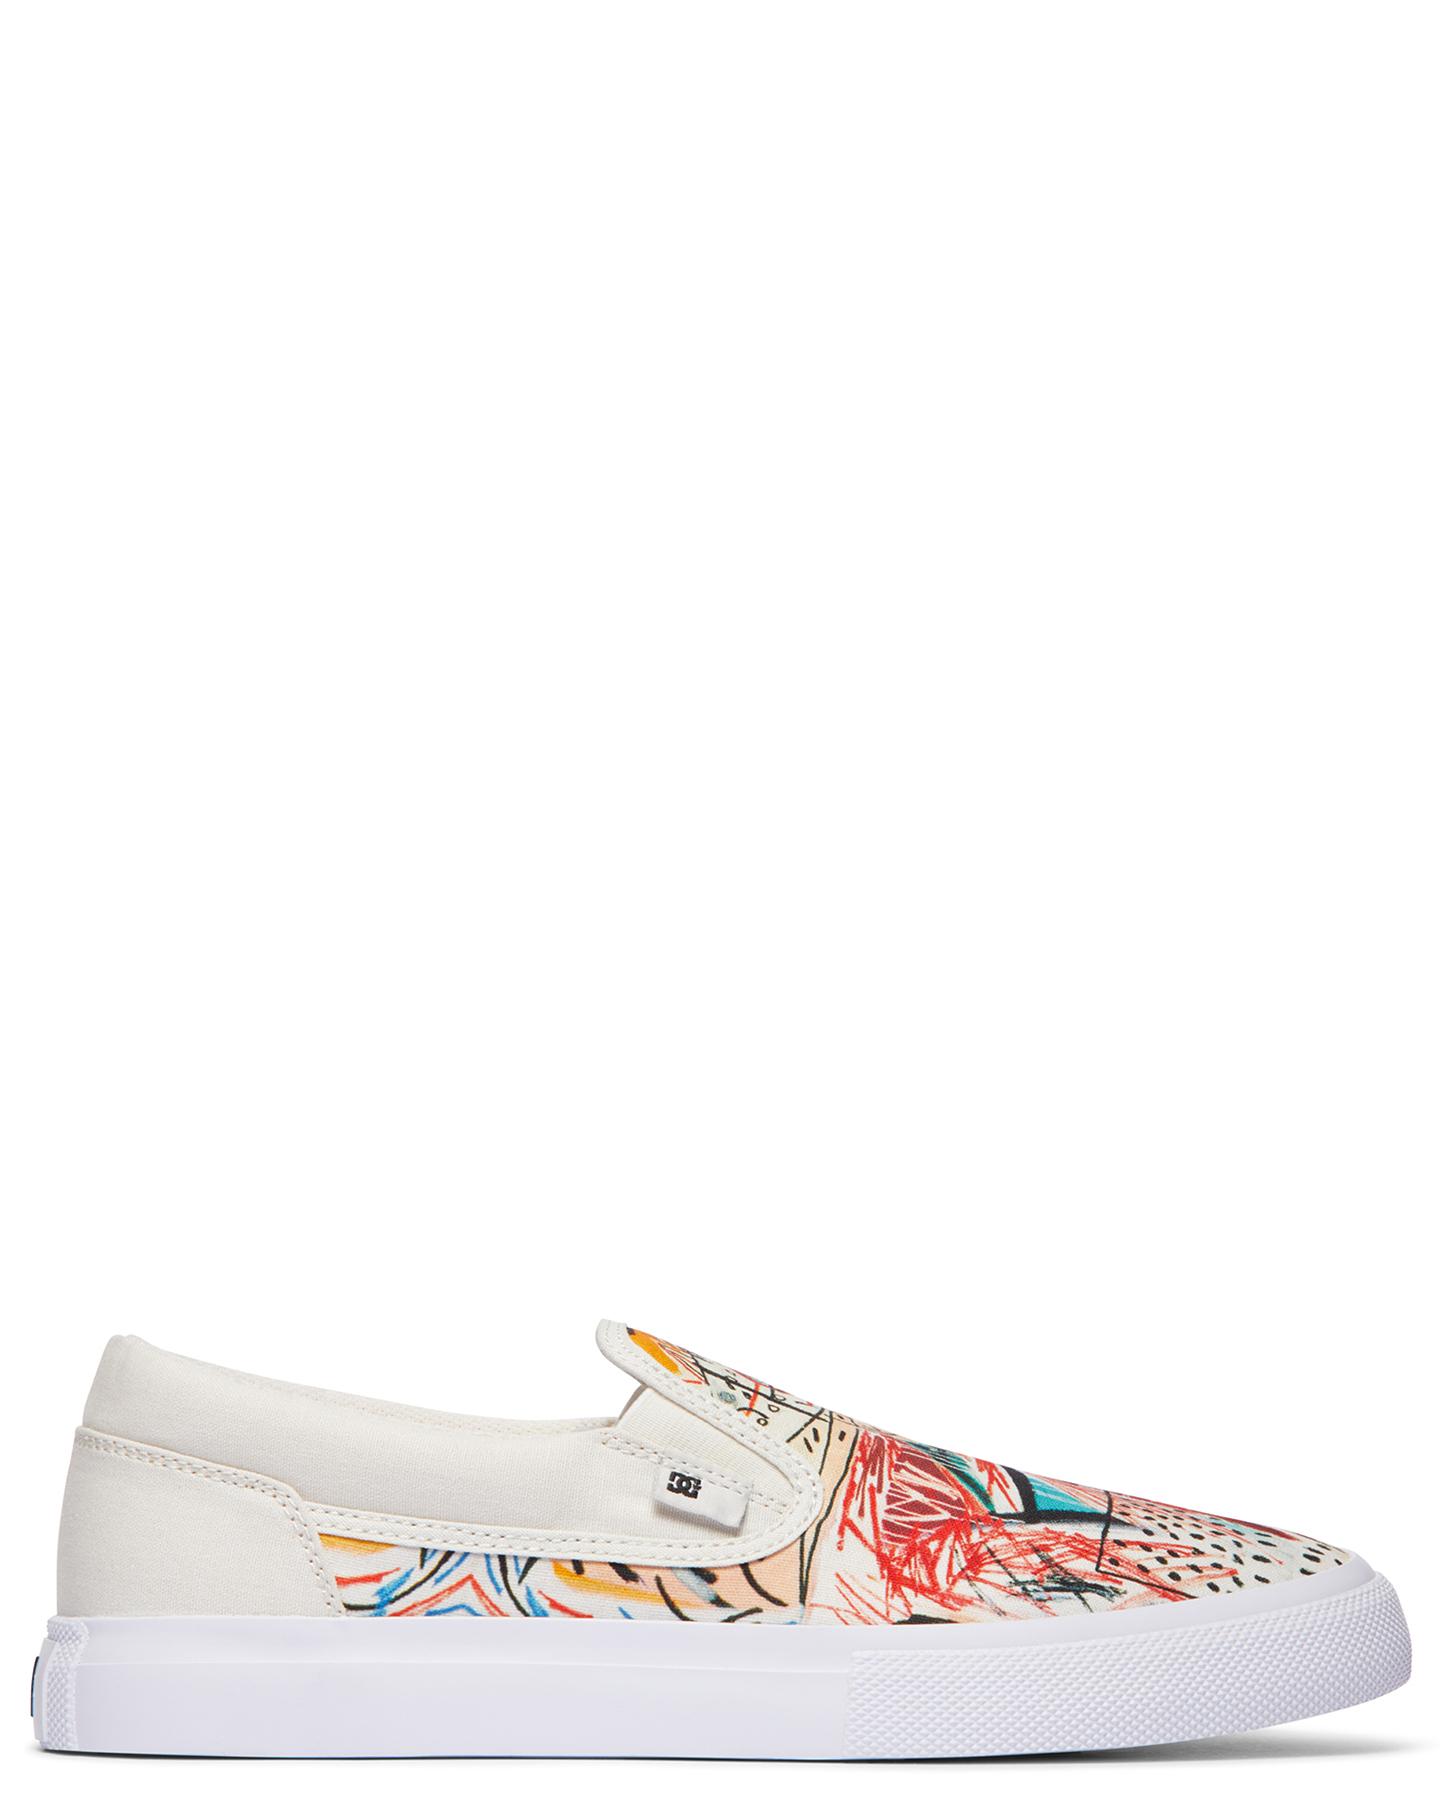 Mens Basquiat Manual Slip On Shoe